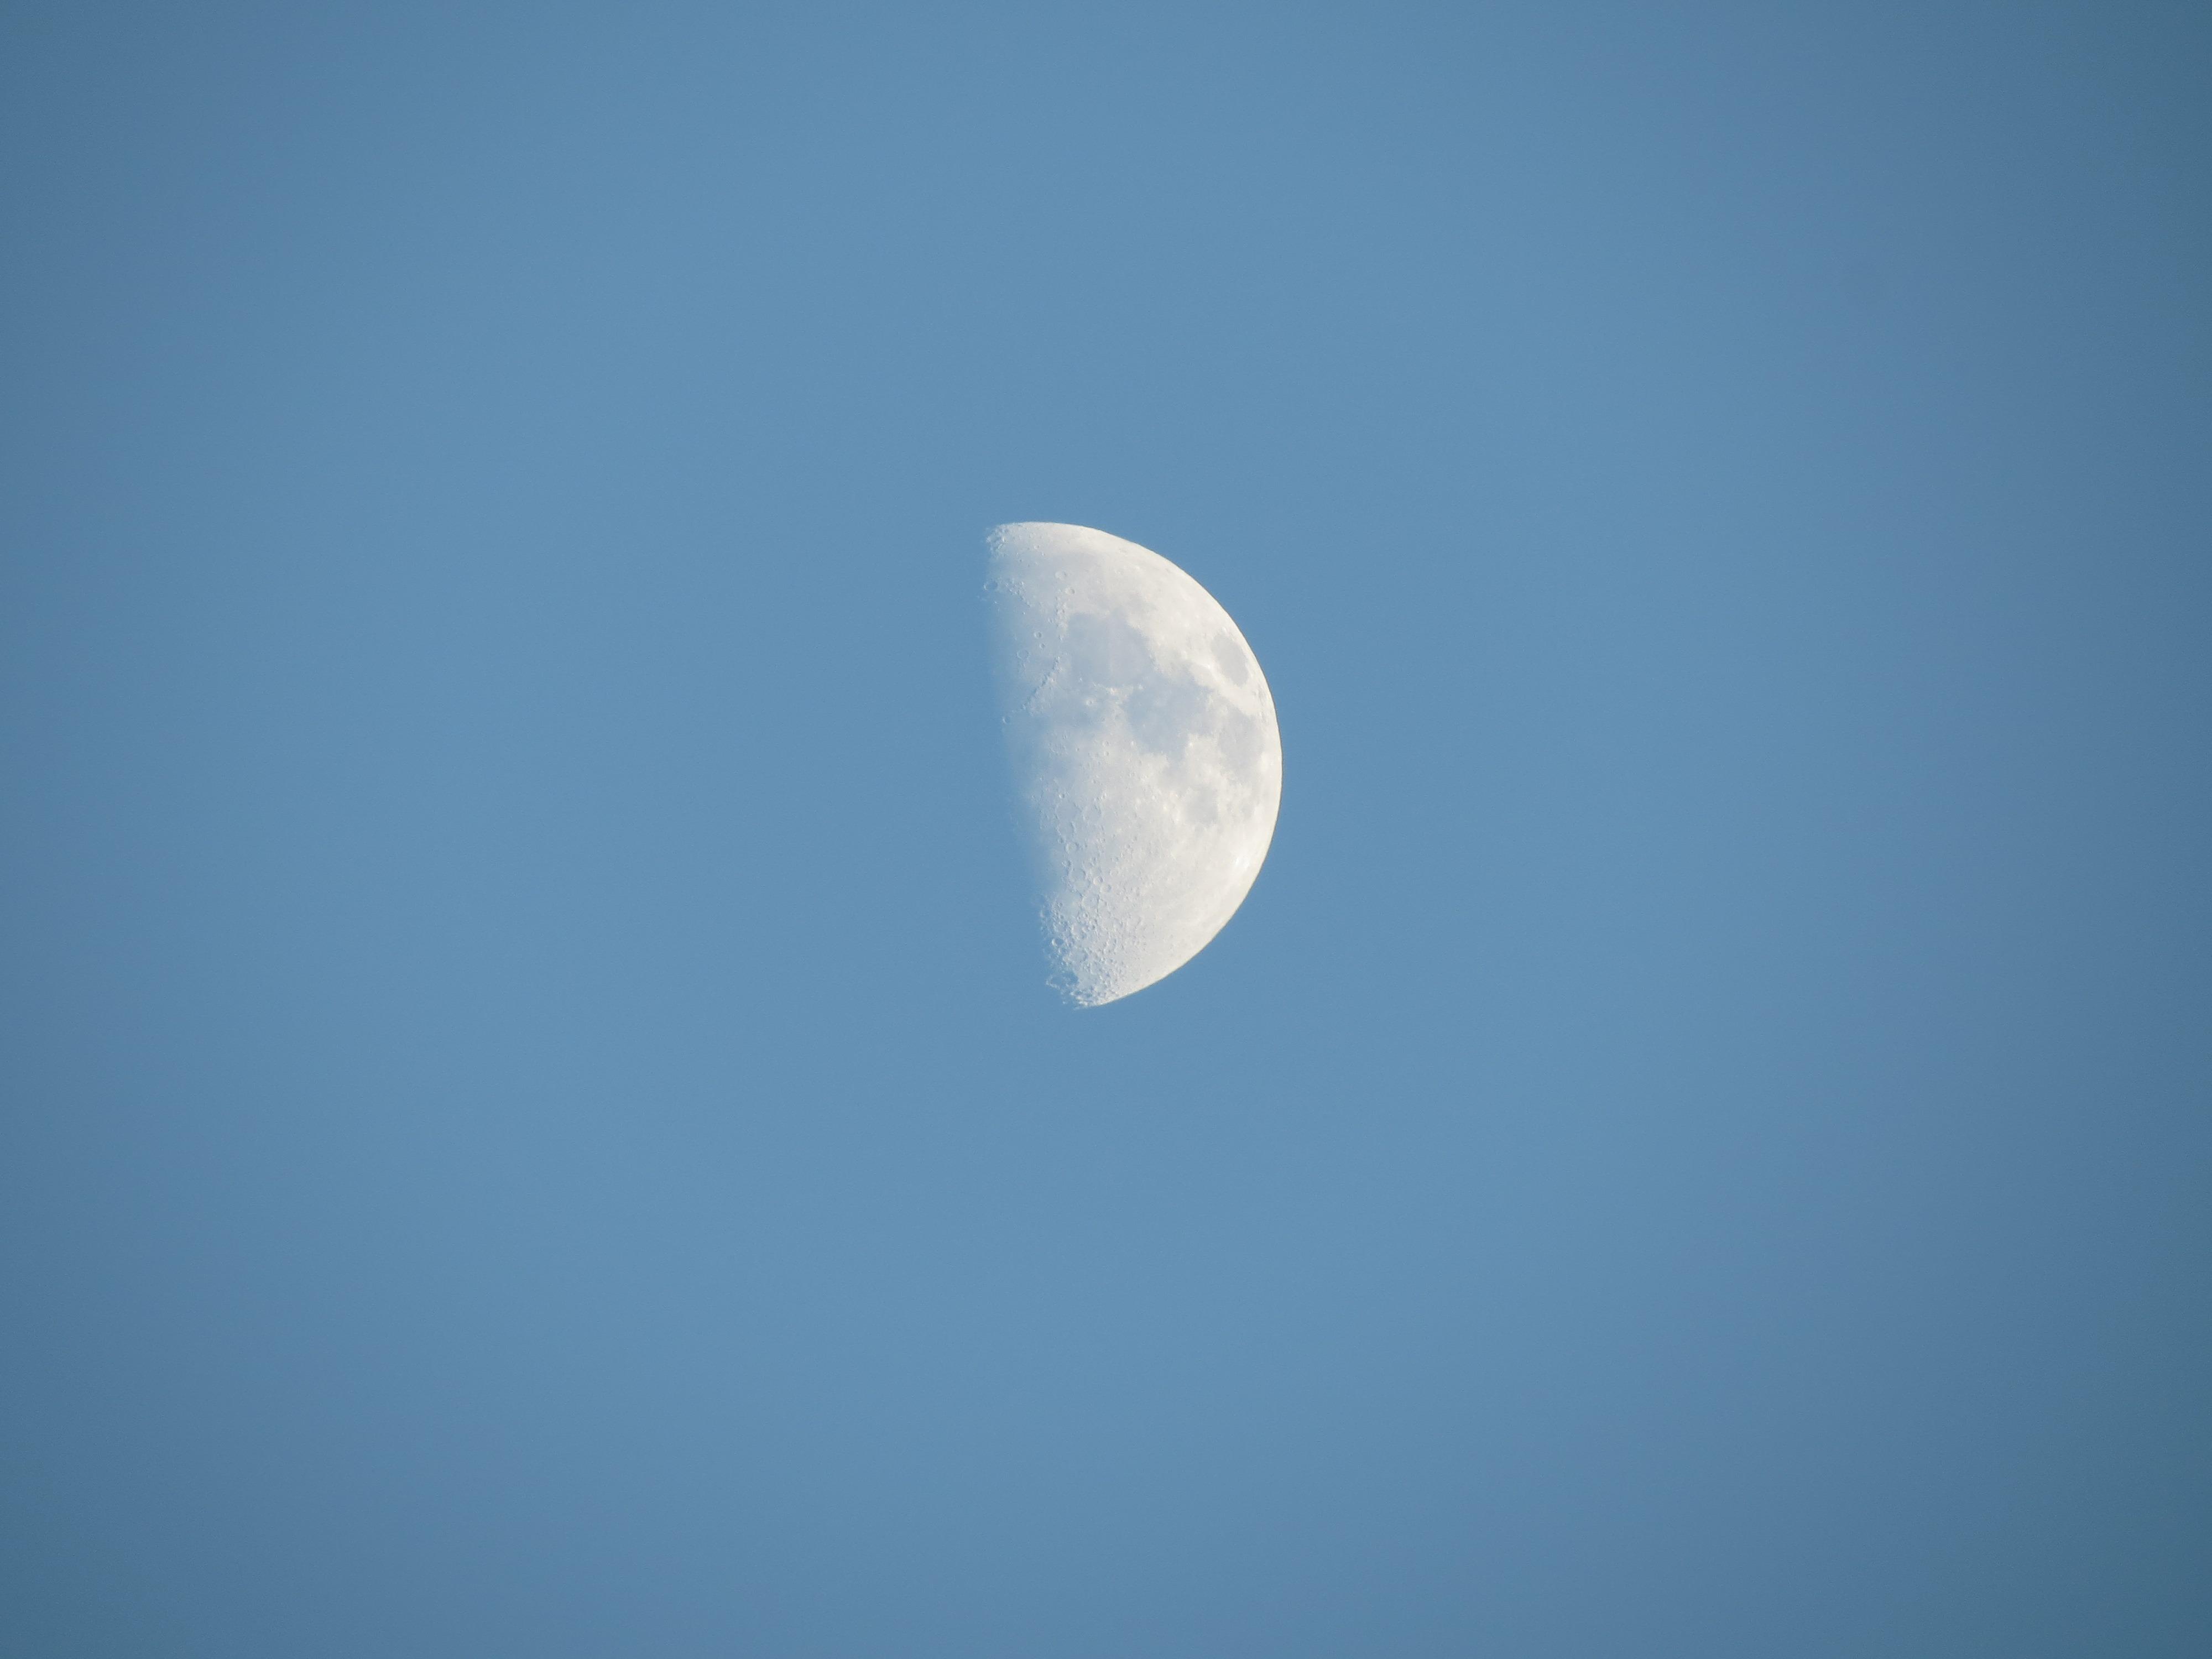 Gambar Awan Langit Suasana Lingkaran Bulan Sabit Objek